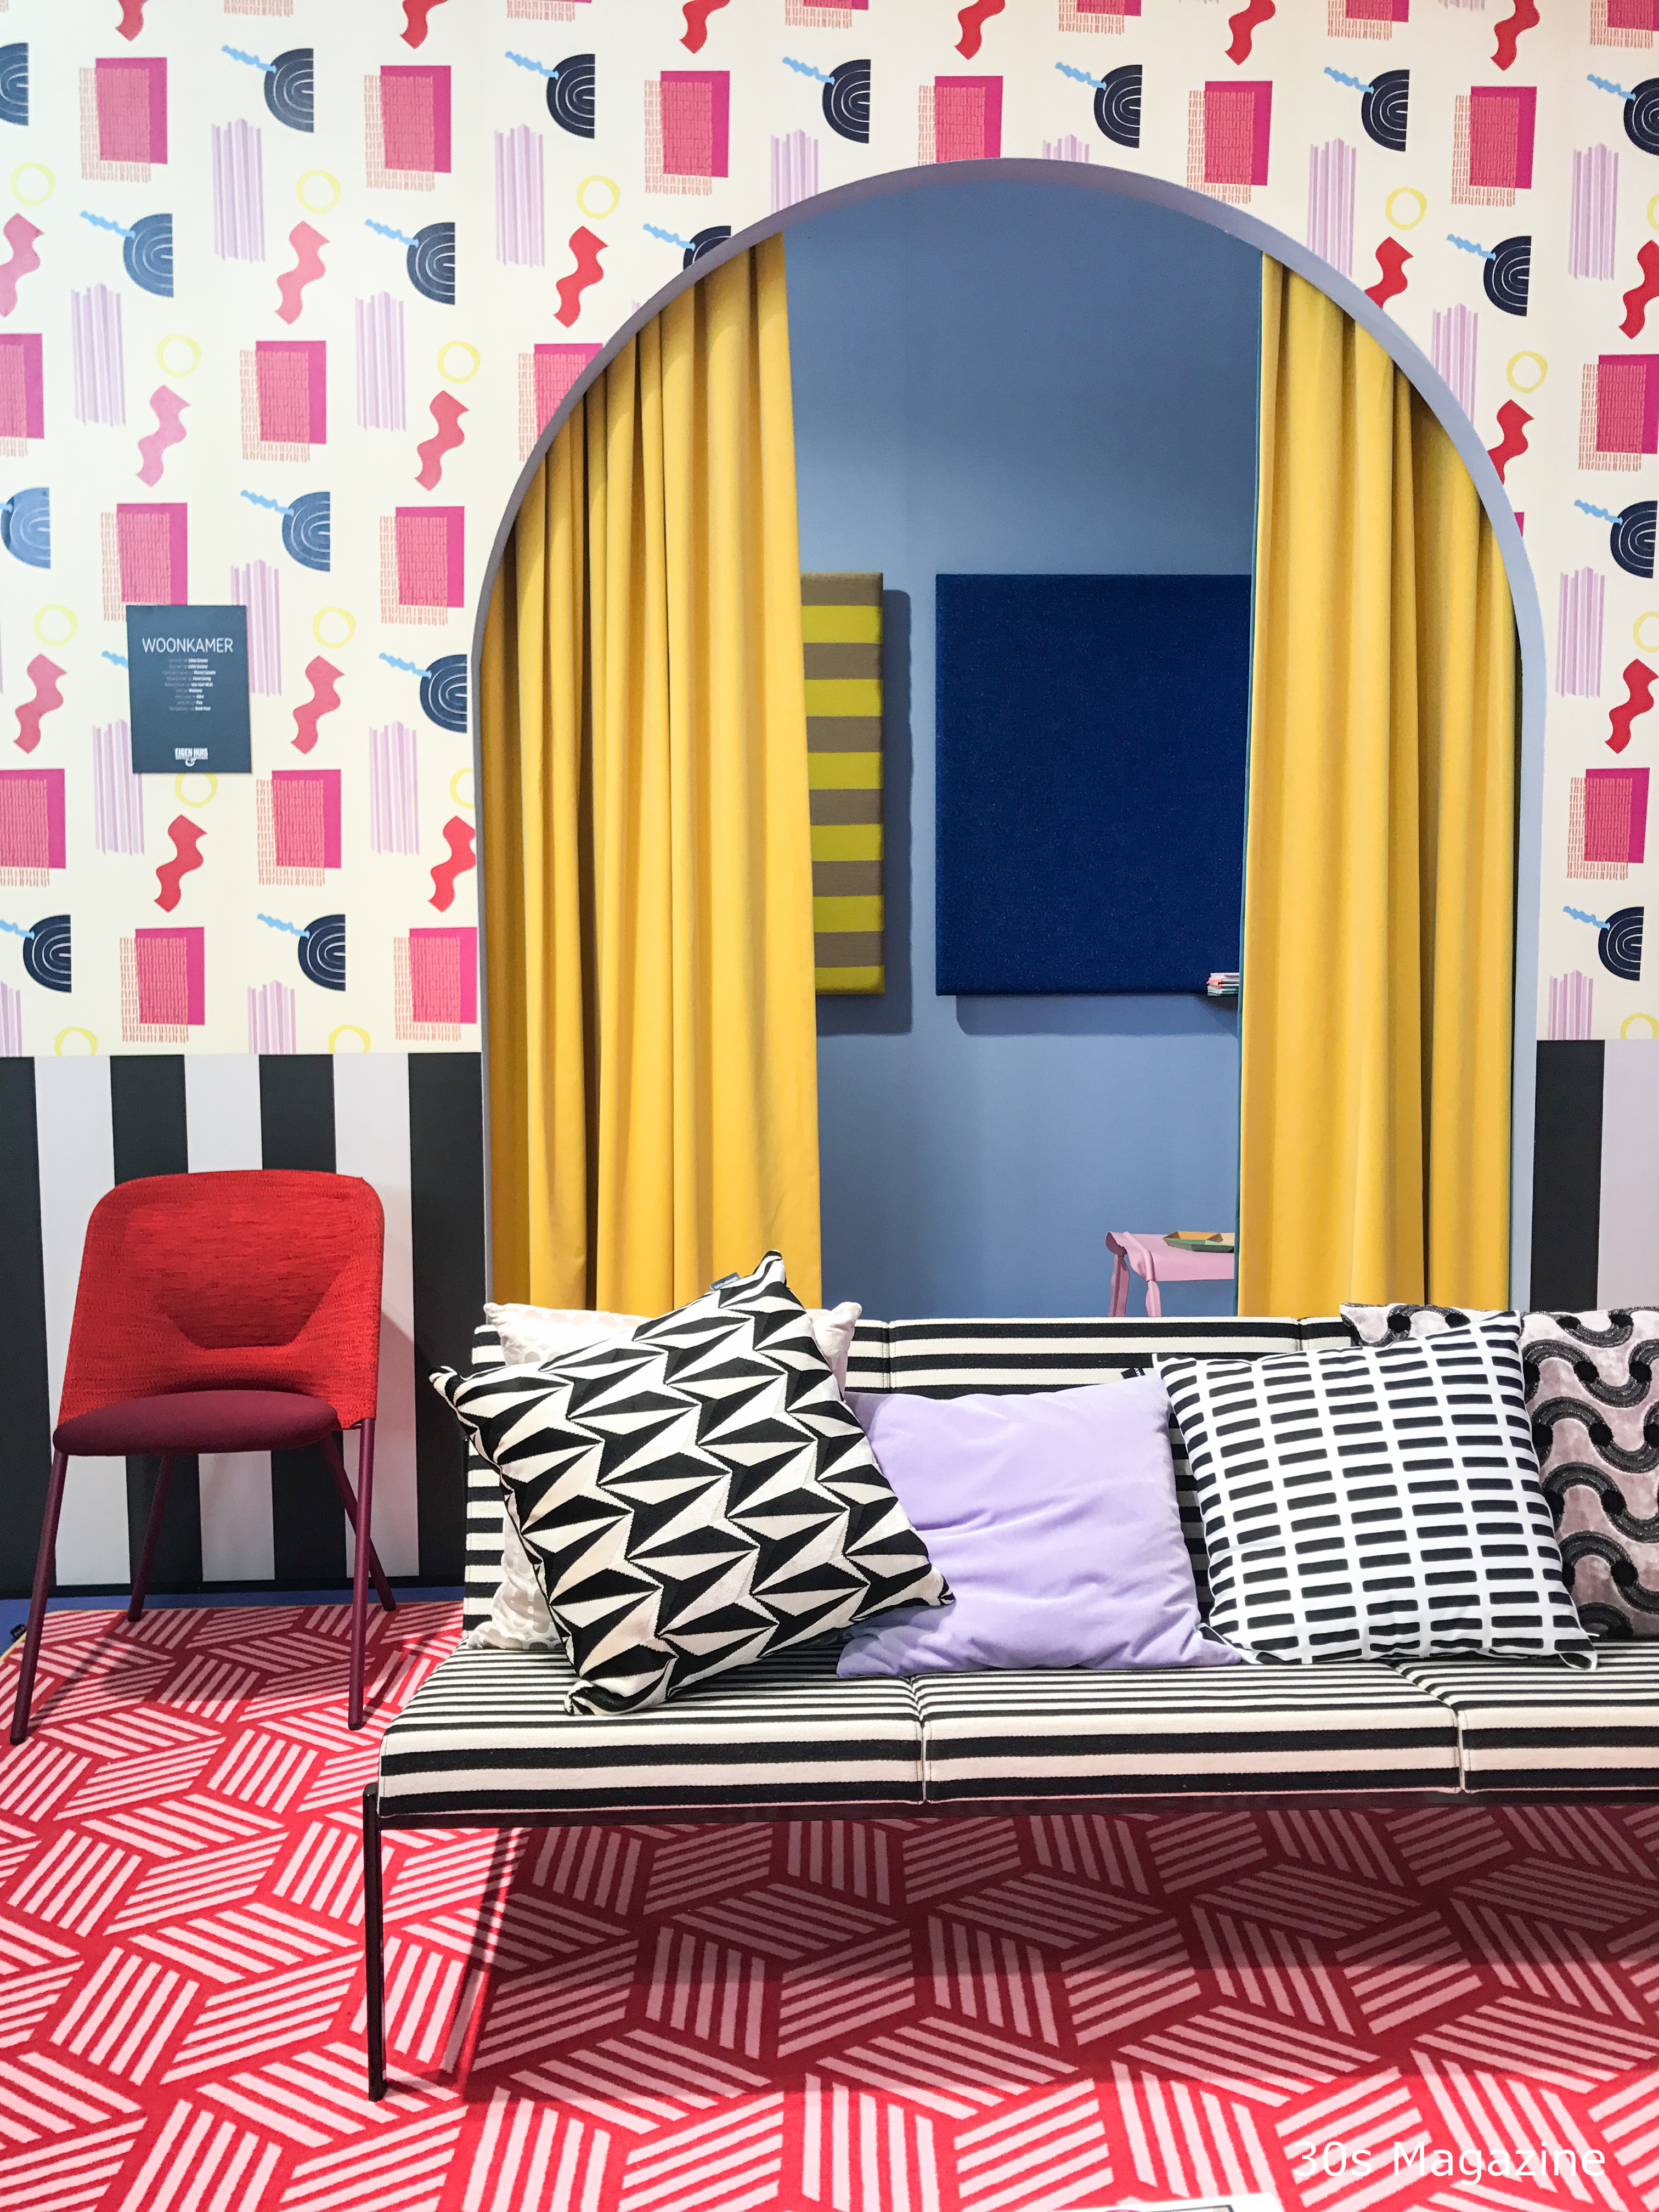 Home Decor Inspiration At The Vt Wonen Design Exhibition 2017 30s Magazine